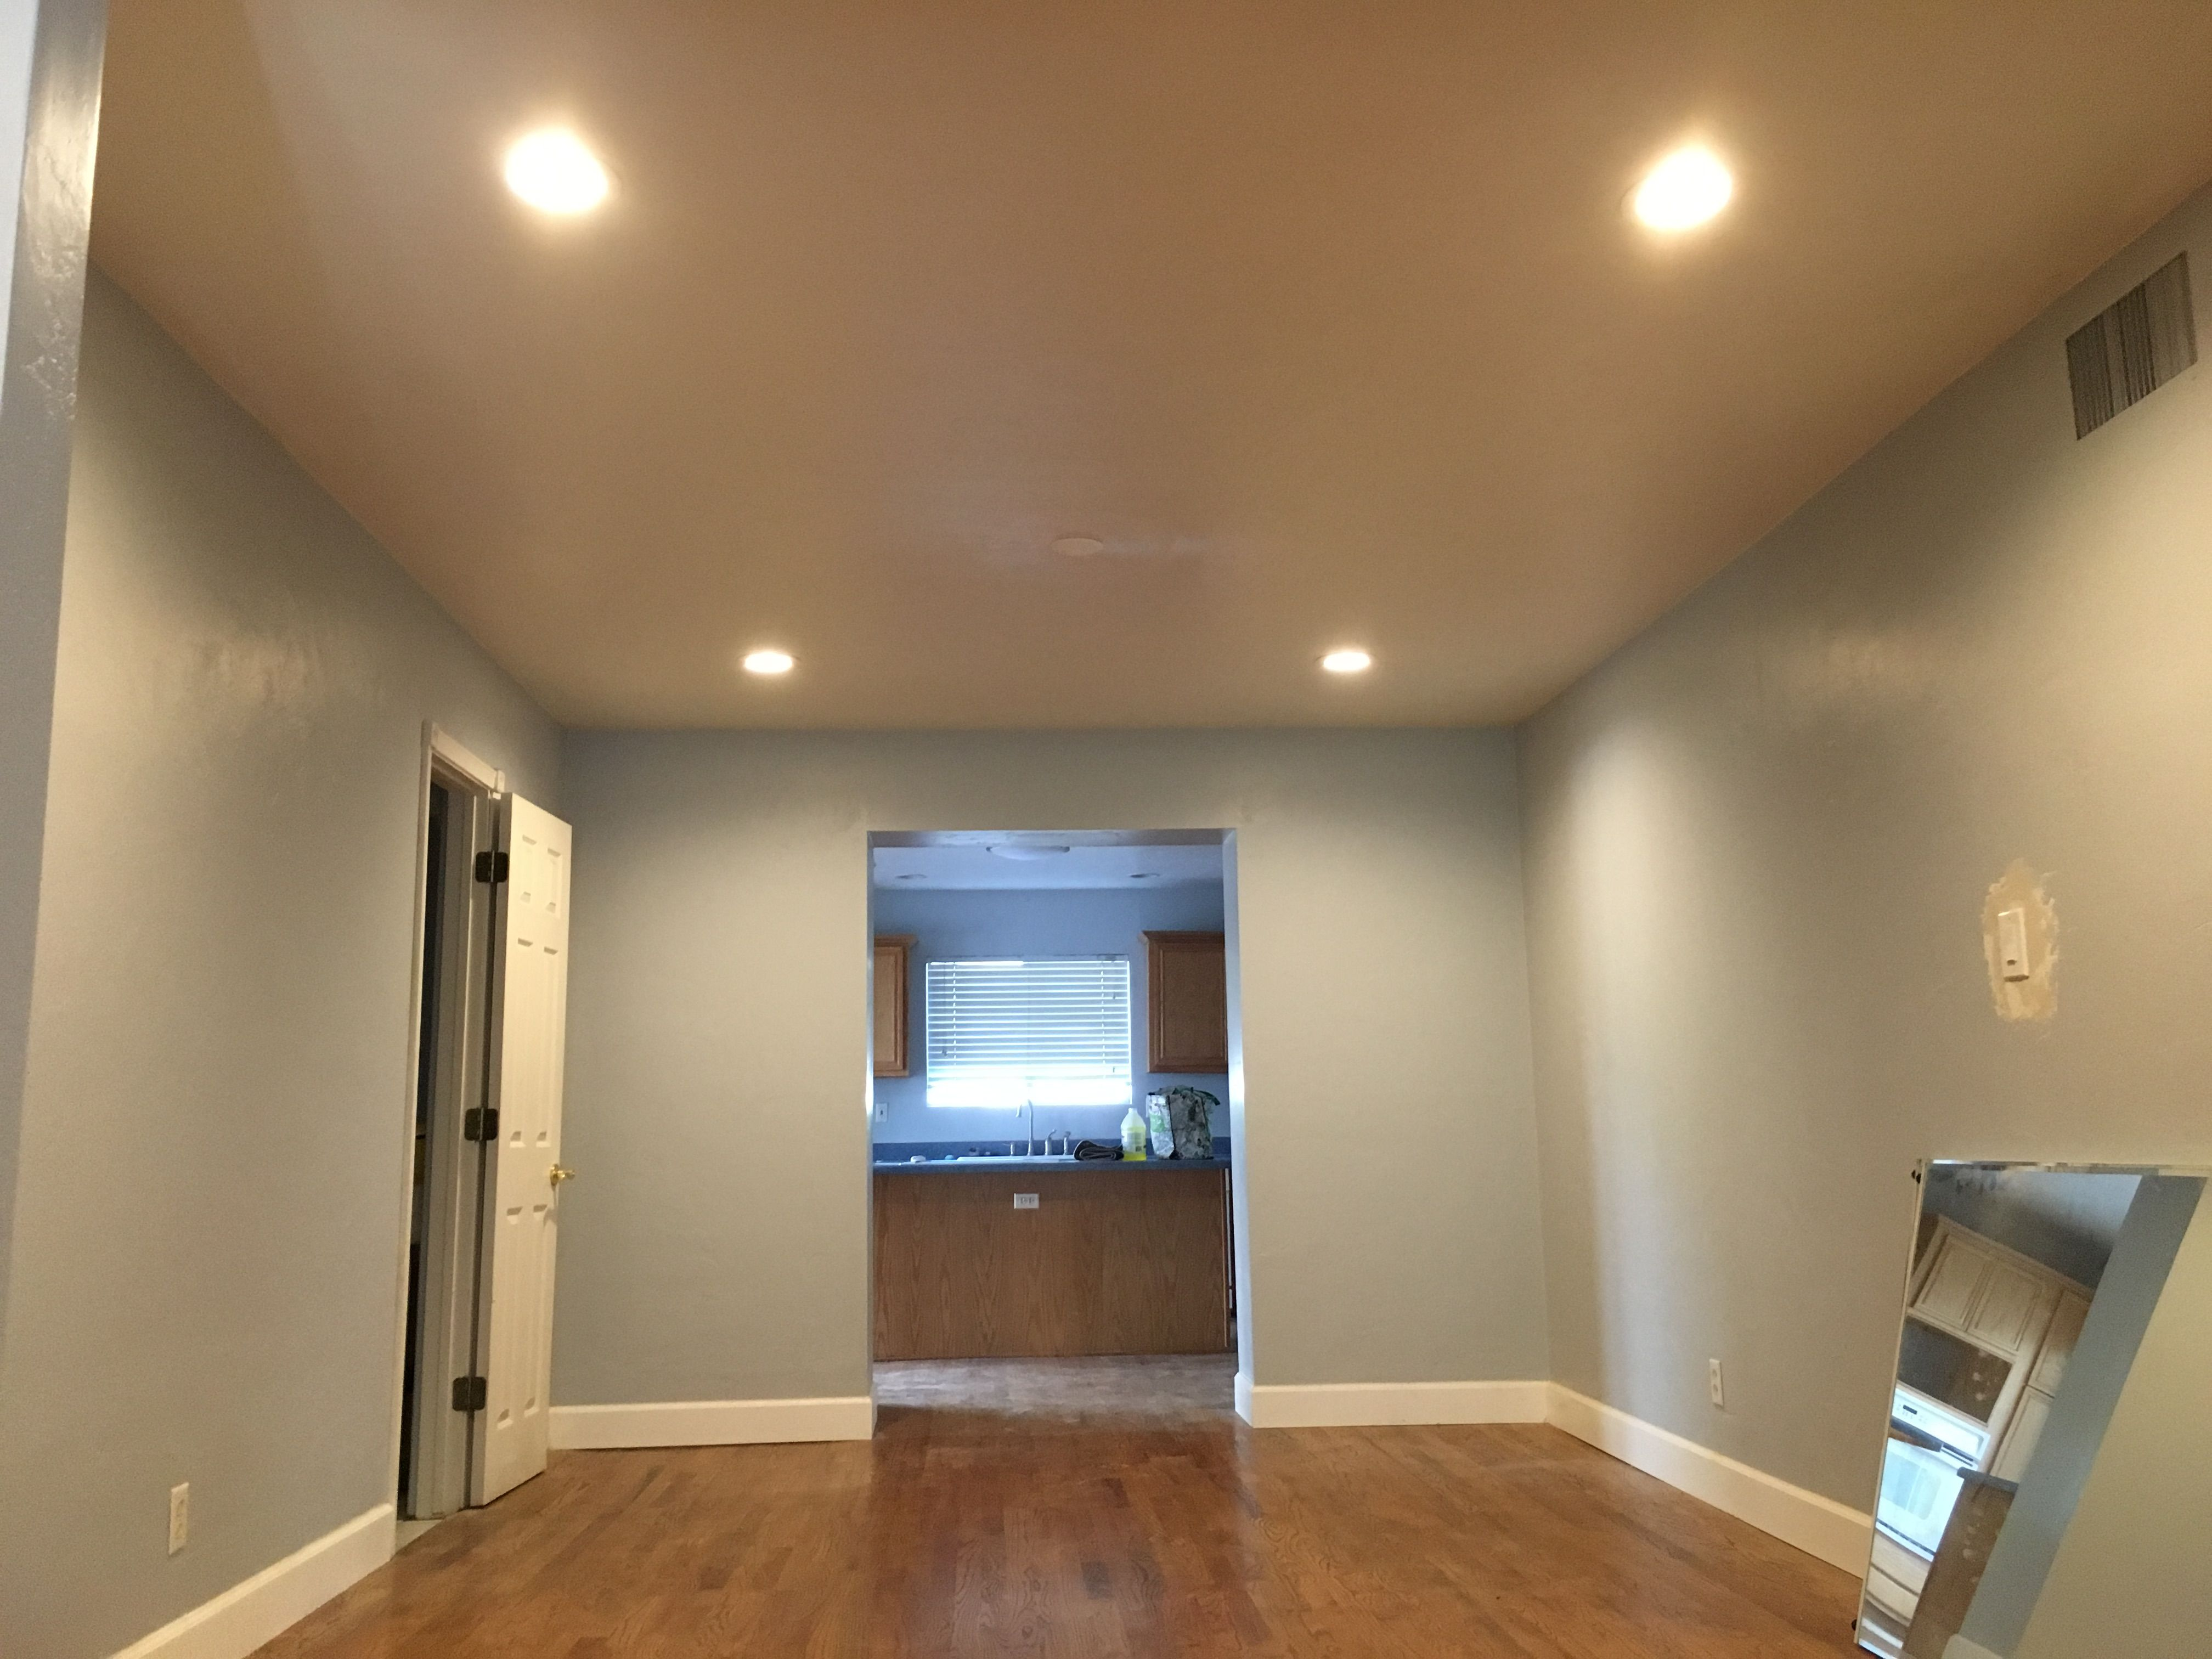 Installed recessed lighting, Phillips Hue lighting for customer ...